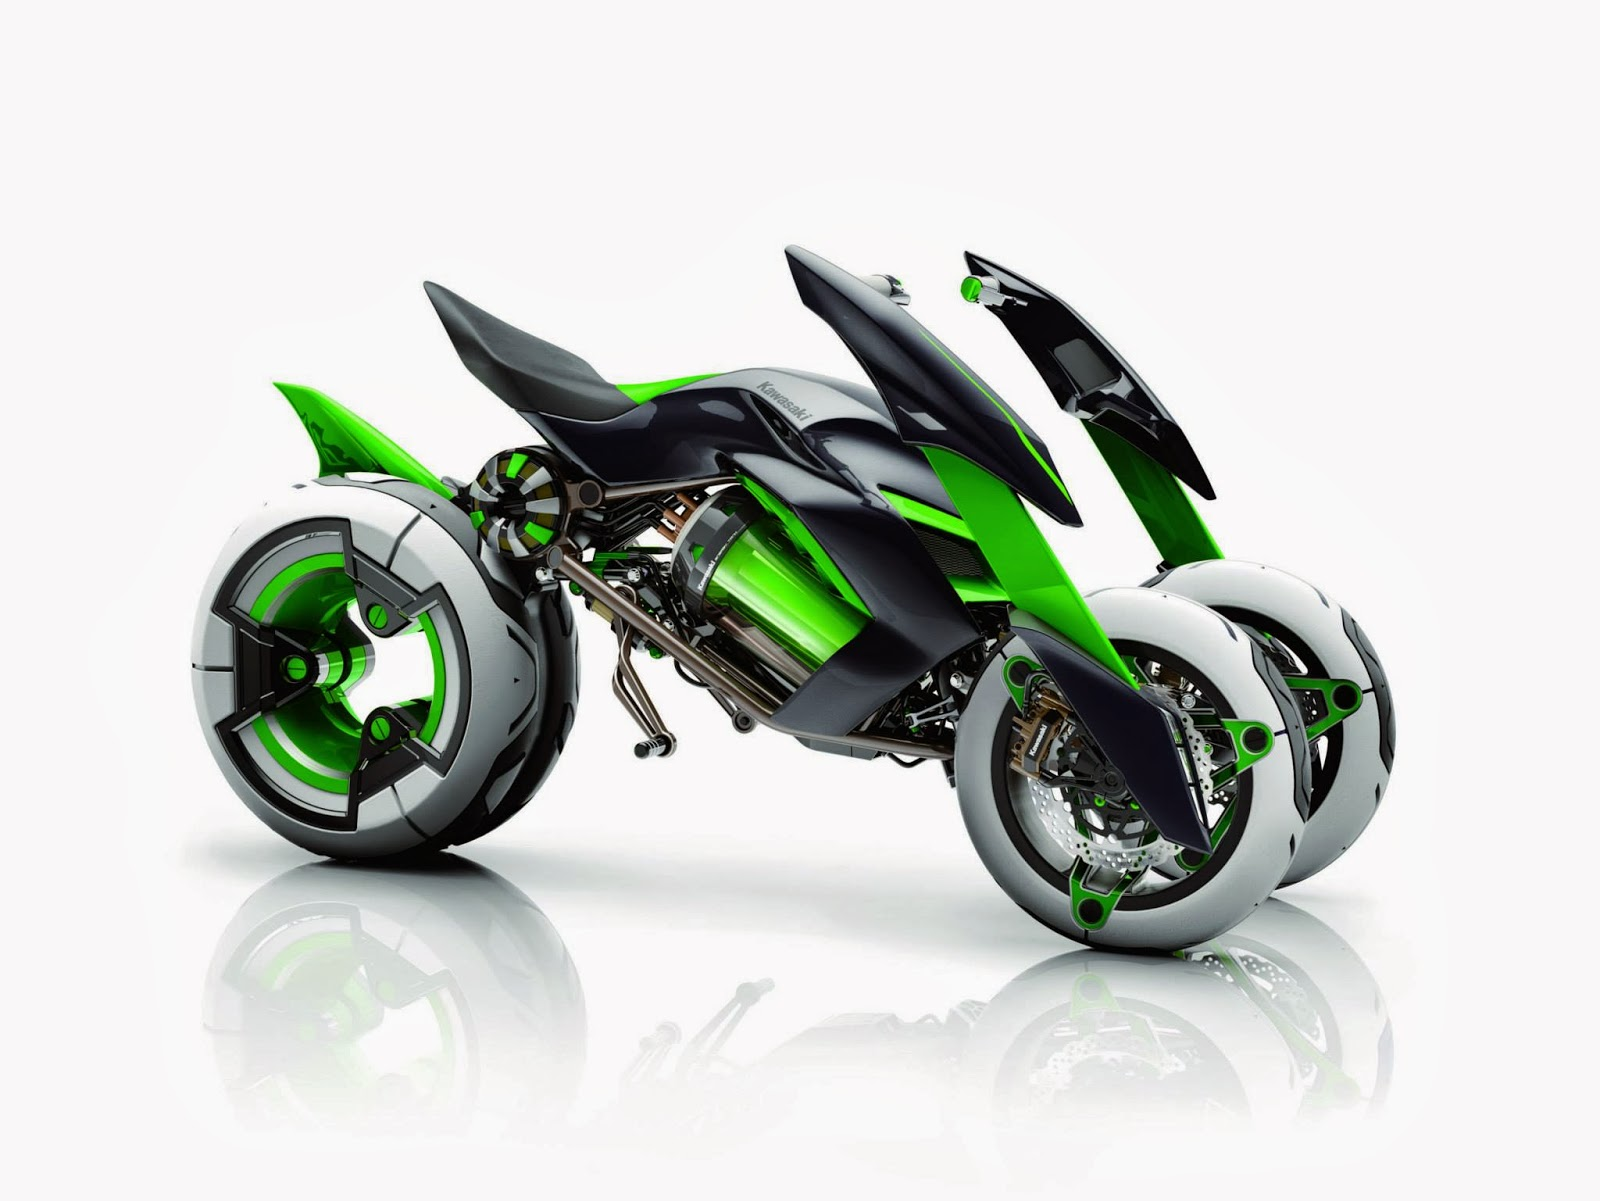 Kawasaki four-wheeled motorcycle